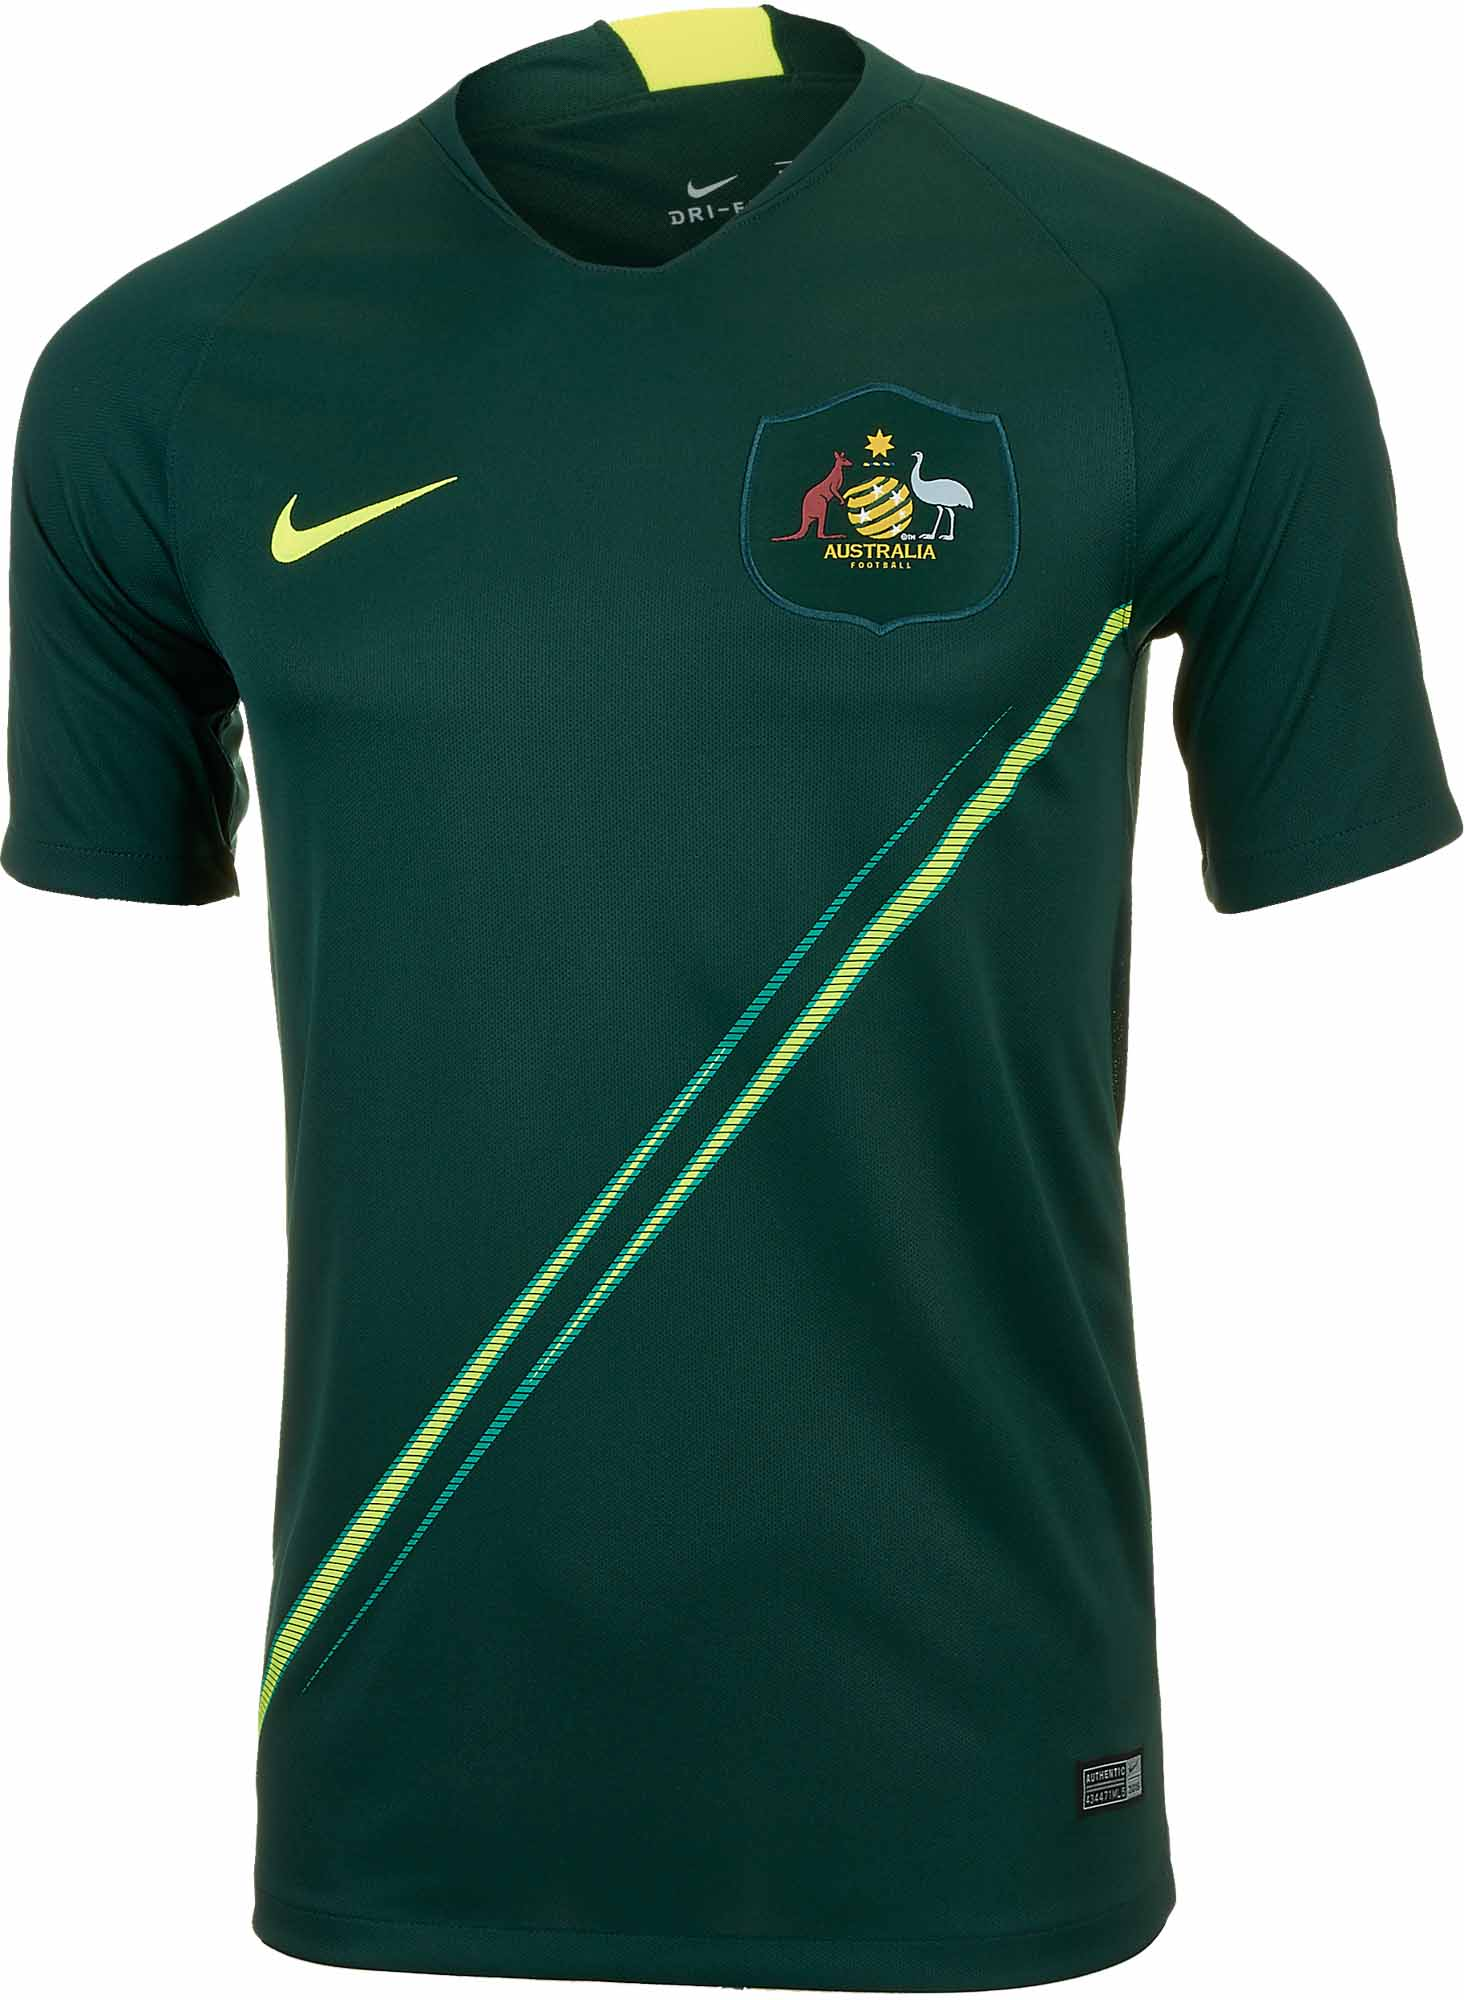 0e102e94a92 Nike Australia Away Jersey 2018-19 - SoccerPro